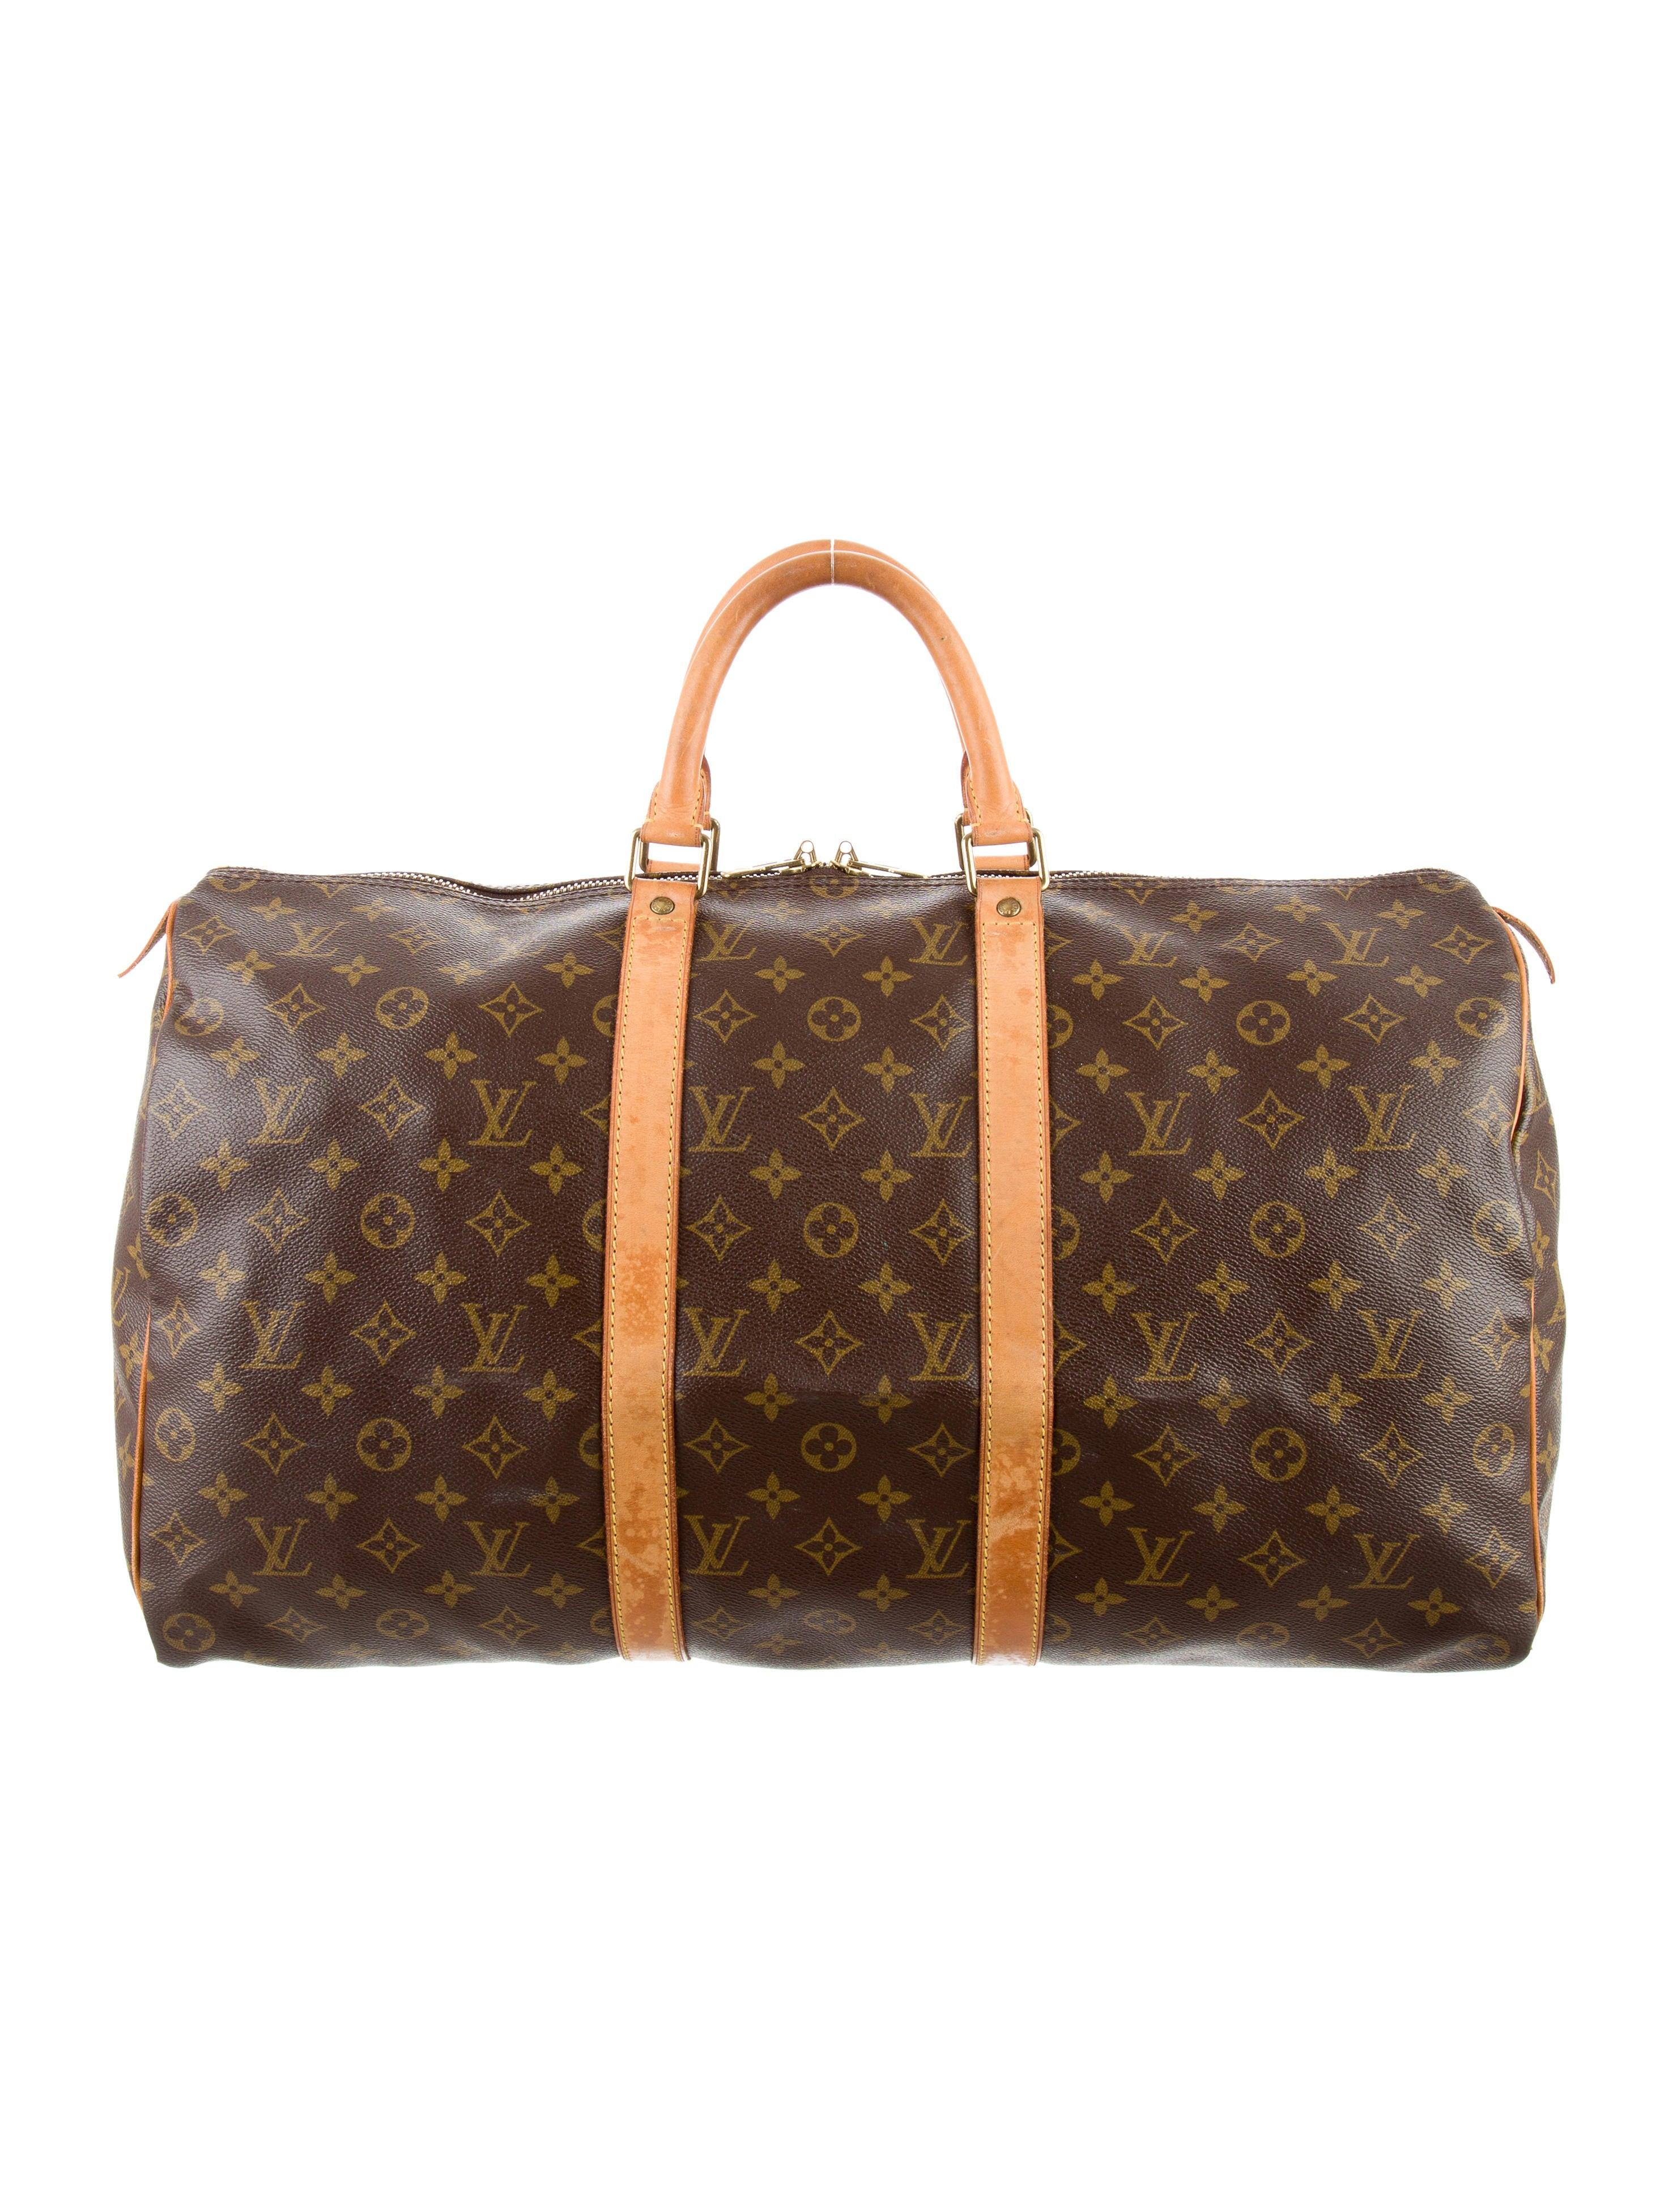 louis vuitton monogram keepall 50 handbags lou112152 the realreal. Black Bedroom Furniture Sets. Home Design Ideas